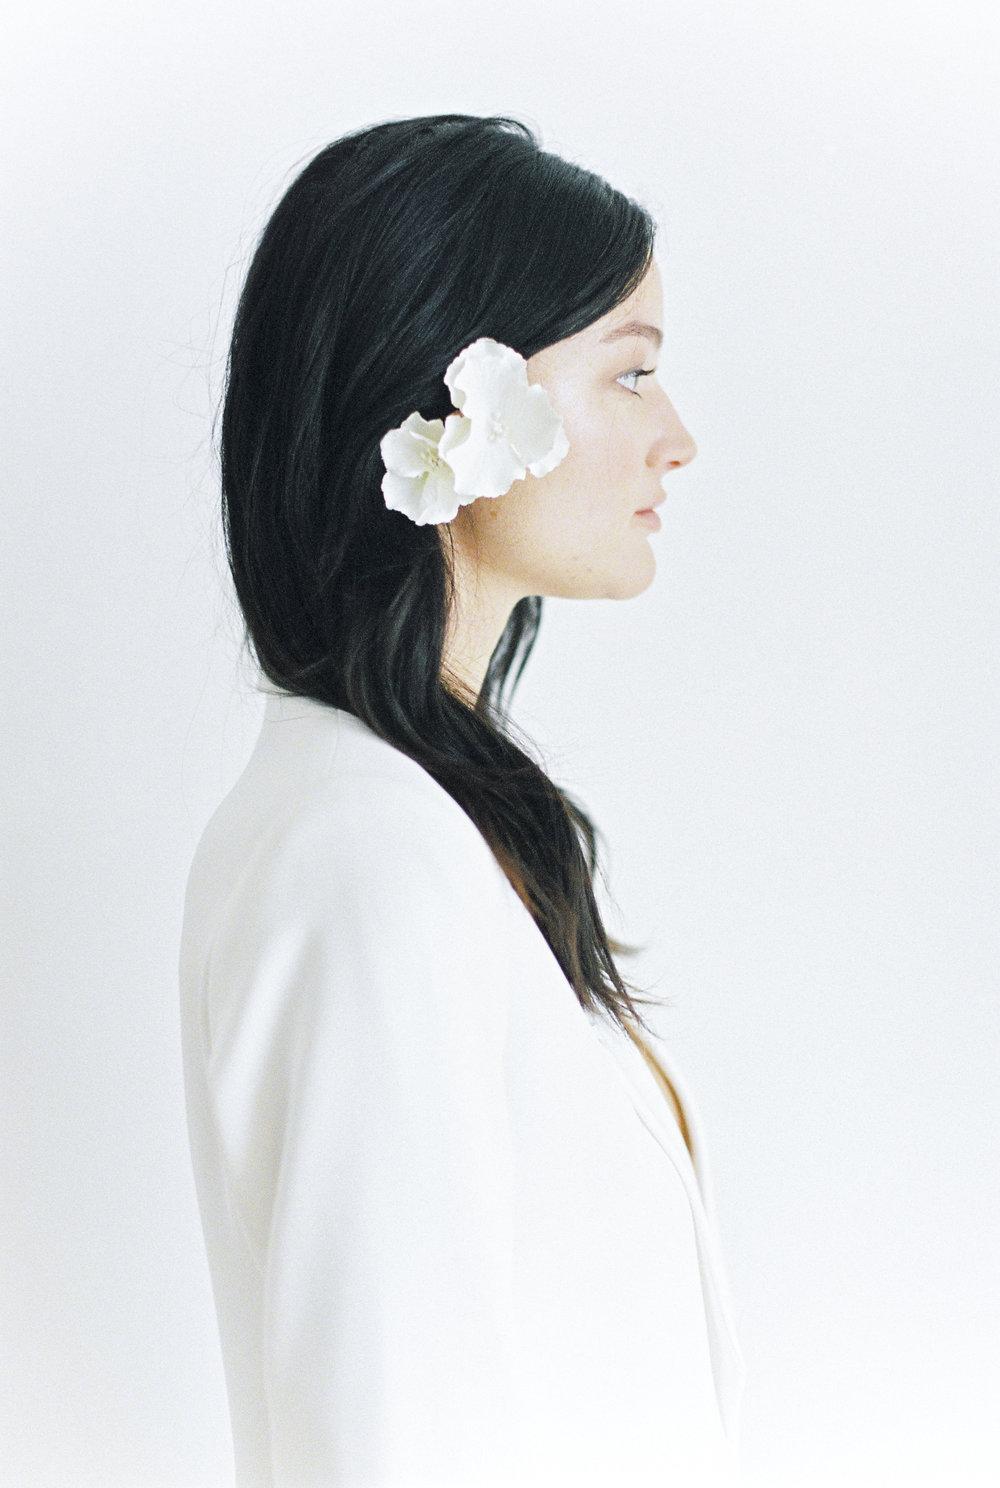 Ludovic Grau-Mingot - Film Photographer - Talitha - Wedding dresses - Collection 2019-206.jpg